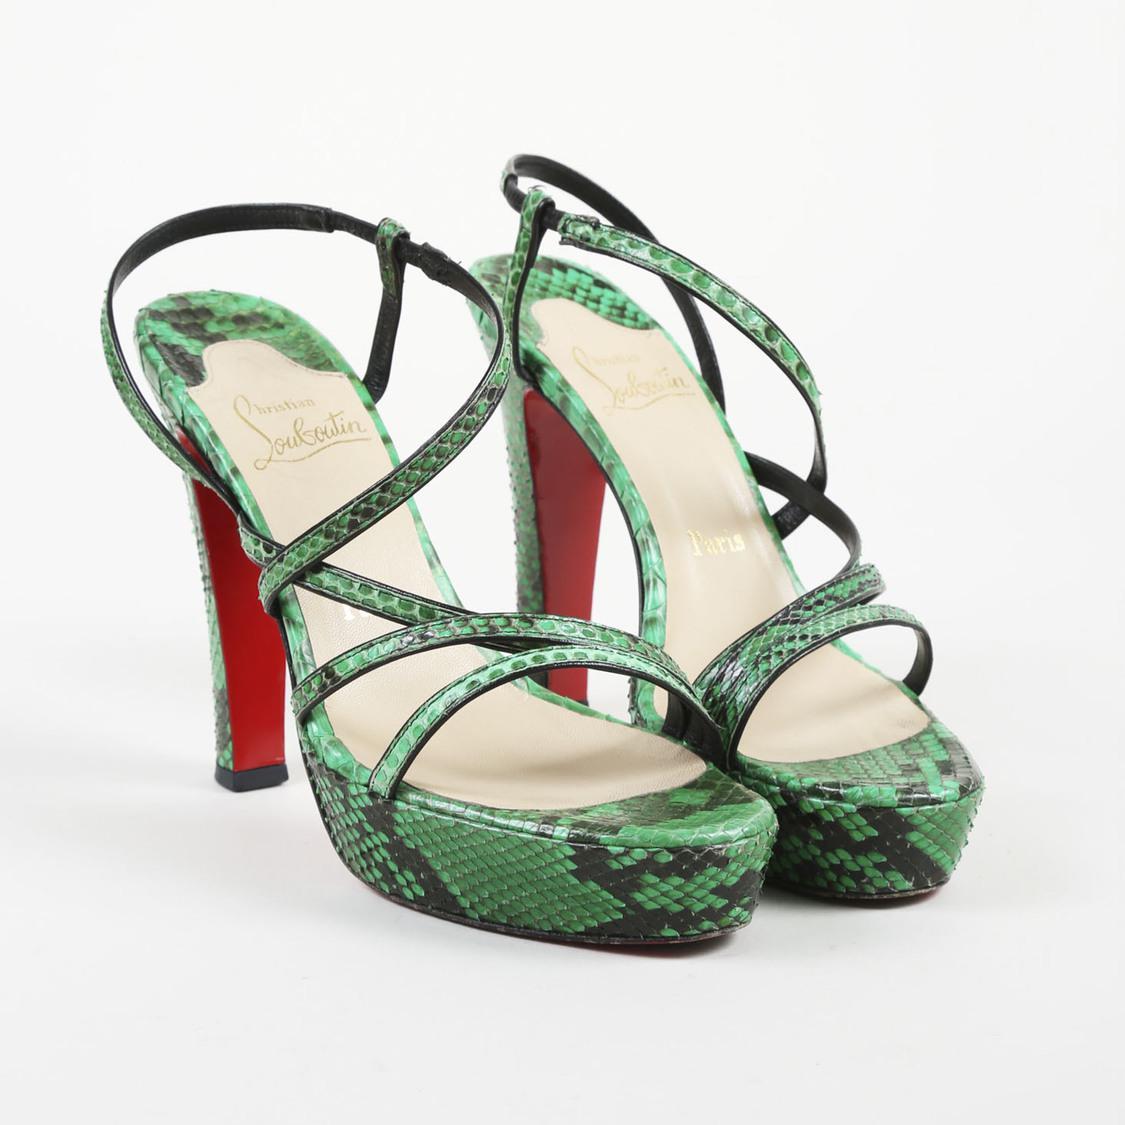 5e85bf00625 Women's Green Snakeskin Open Toe Strappy Sandals